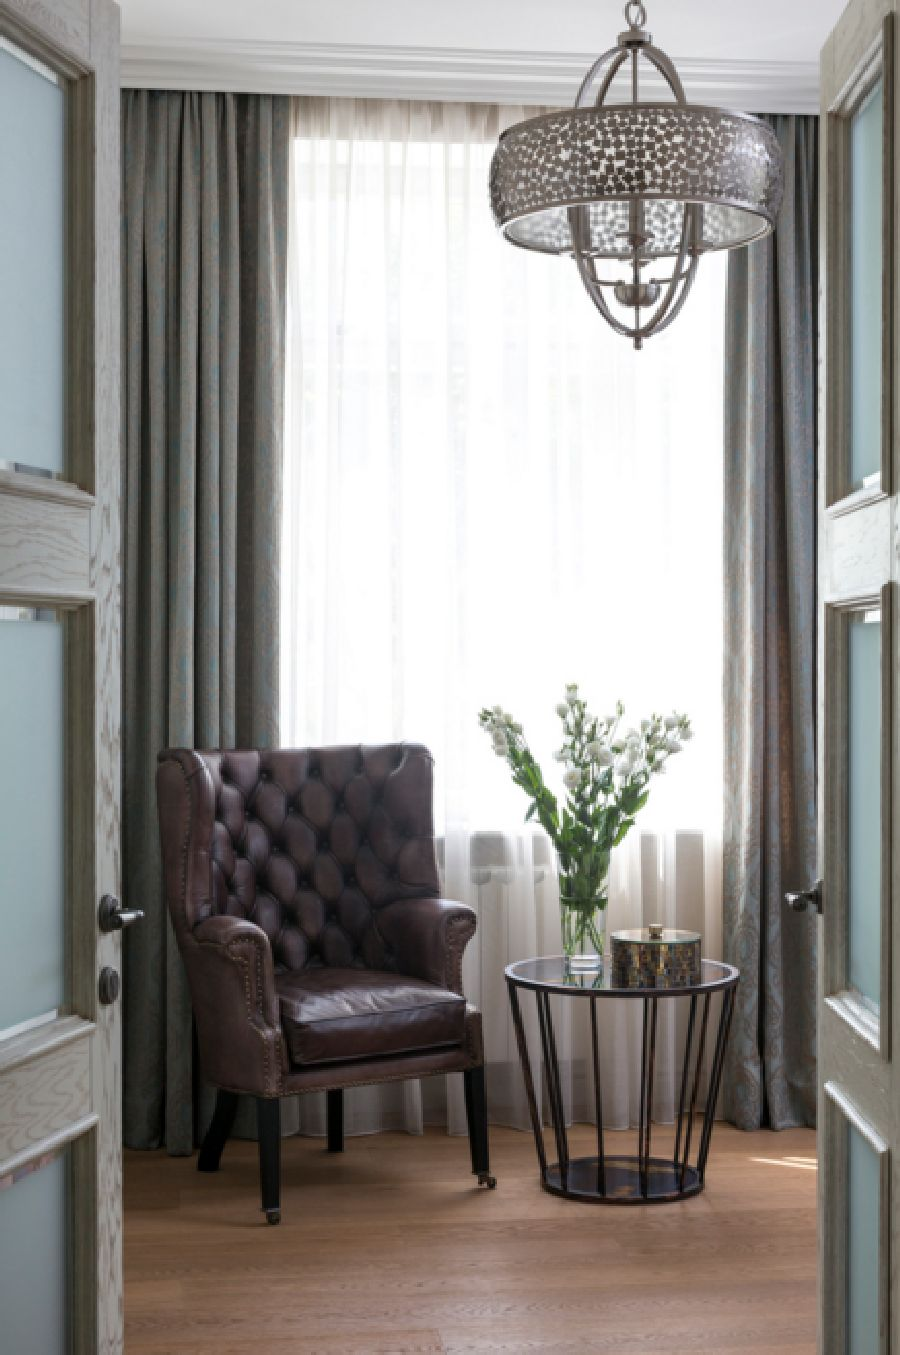 adelaparvu.com despre apartament de 80 mp patrati cu aer rustic elegant, locuinta Rusia, designer Zhenya Zhdanova (10)